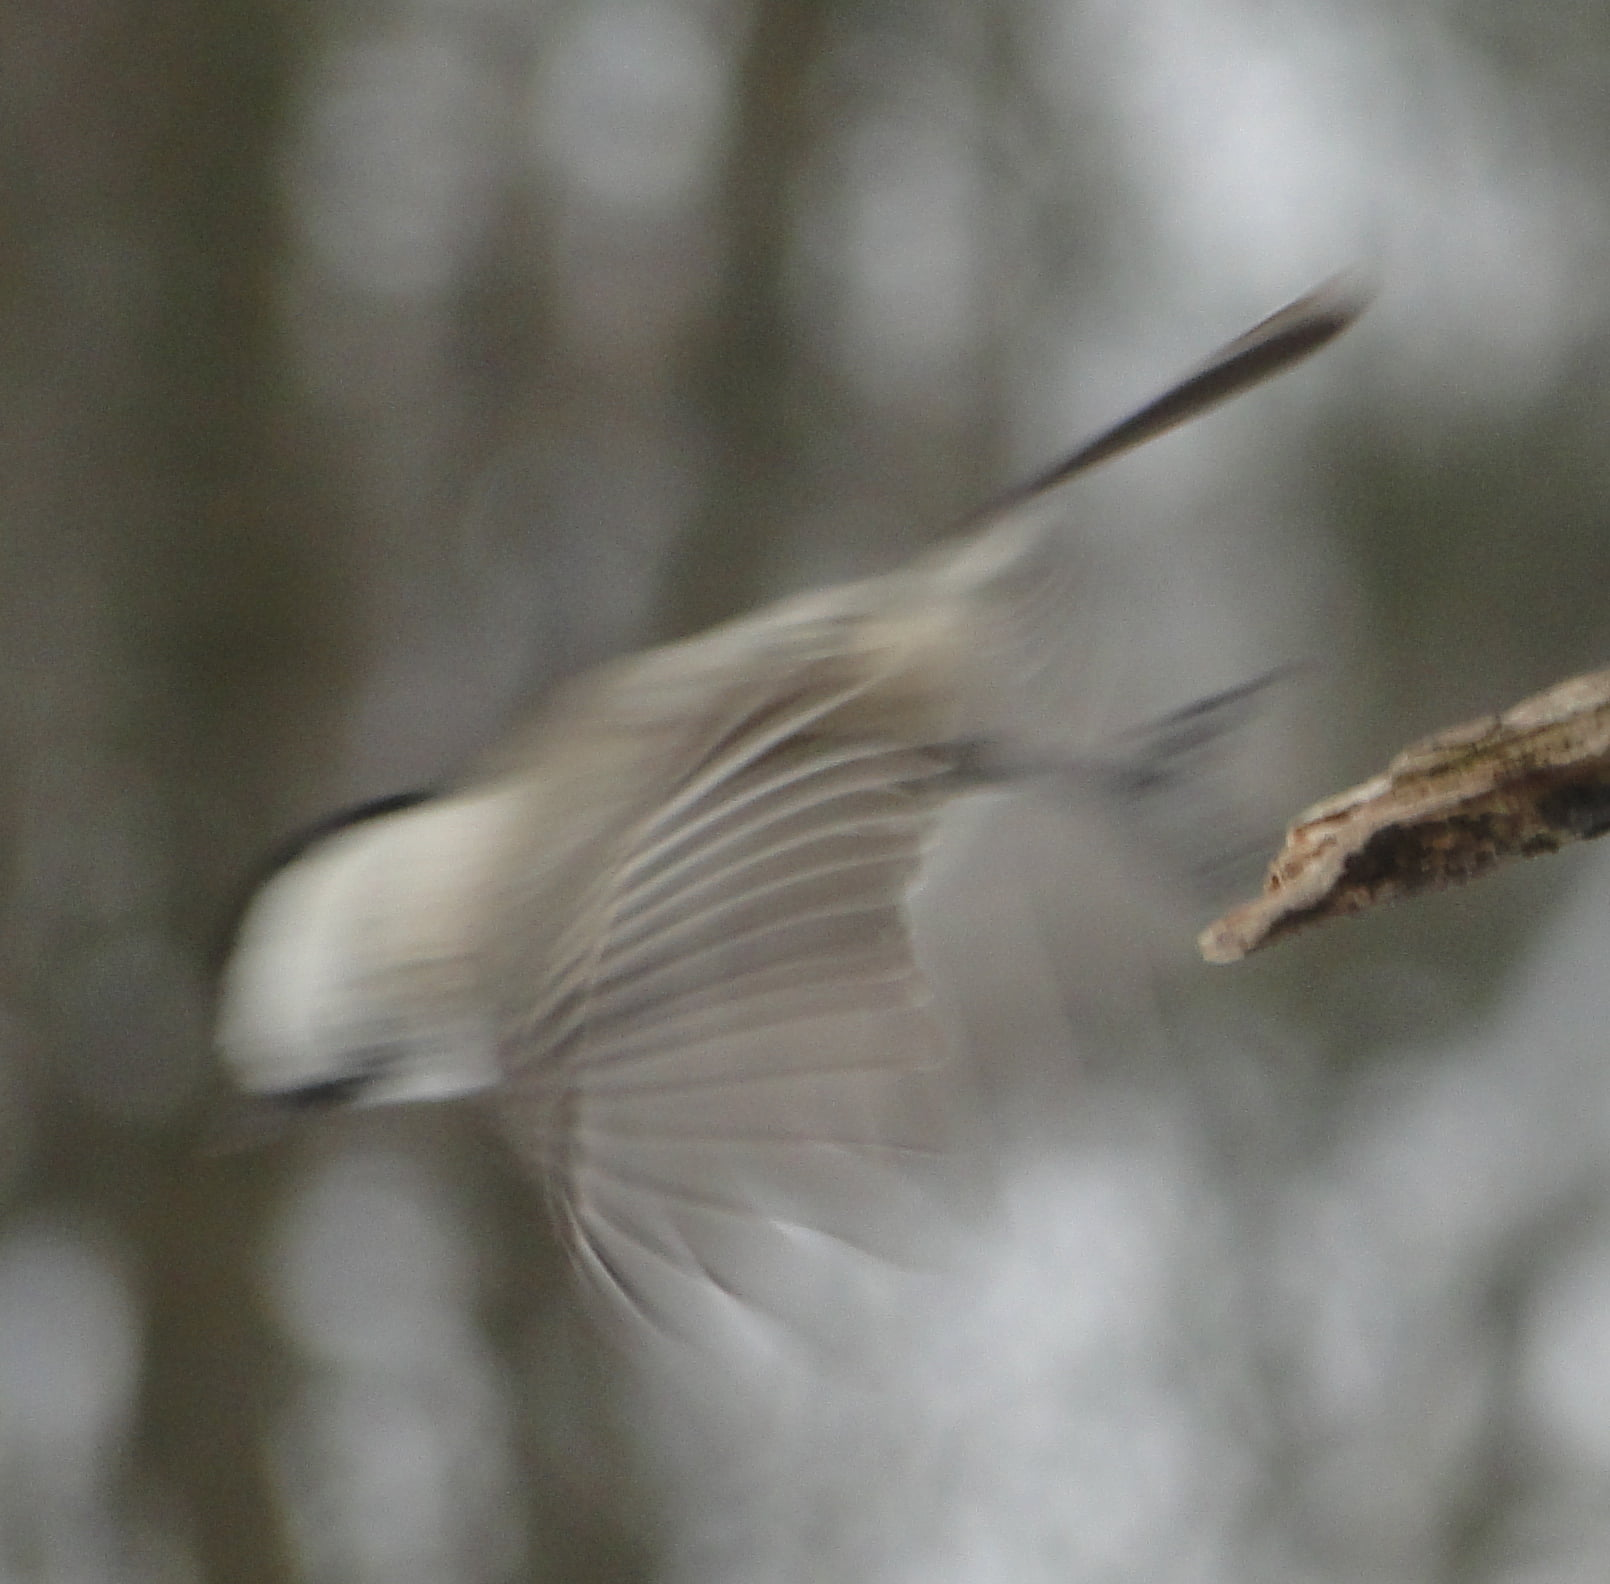 Nasi zimowi ptasi przyjaciele 5